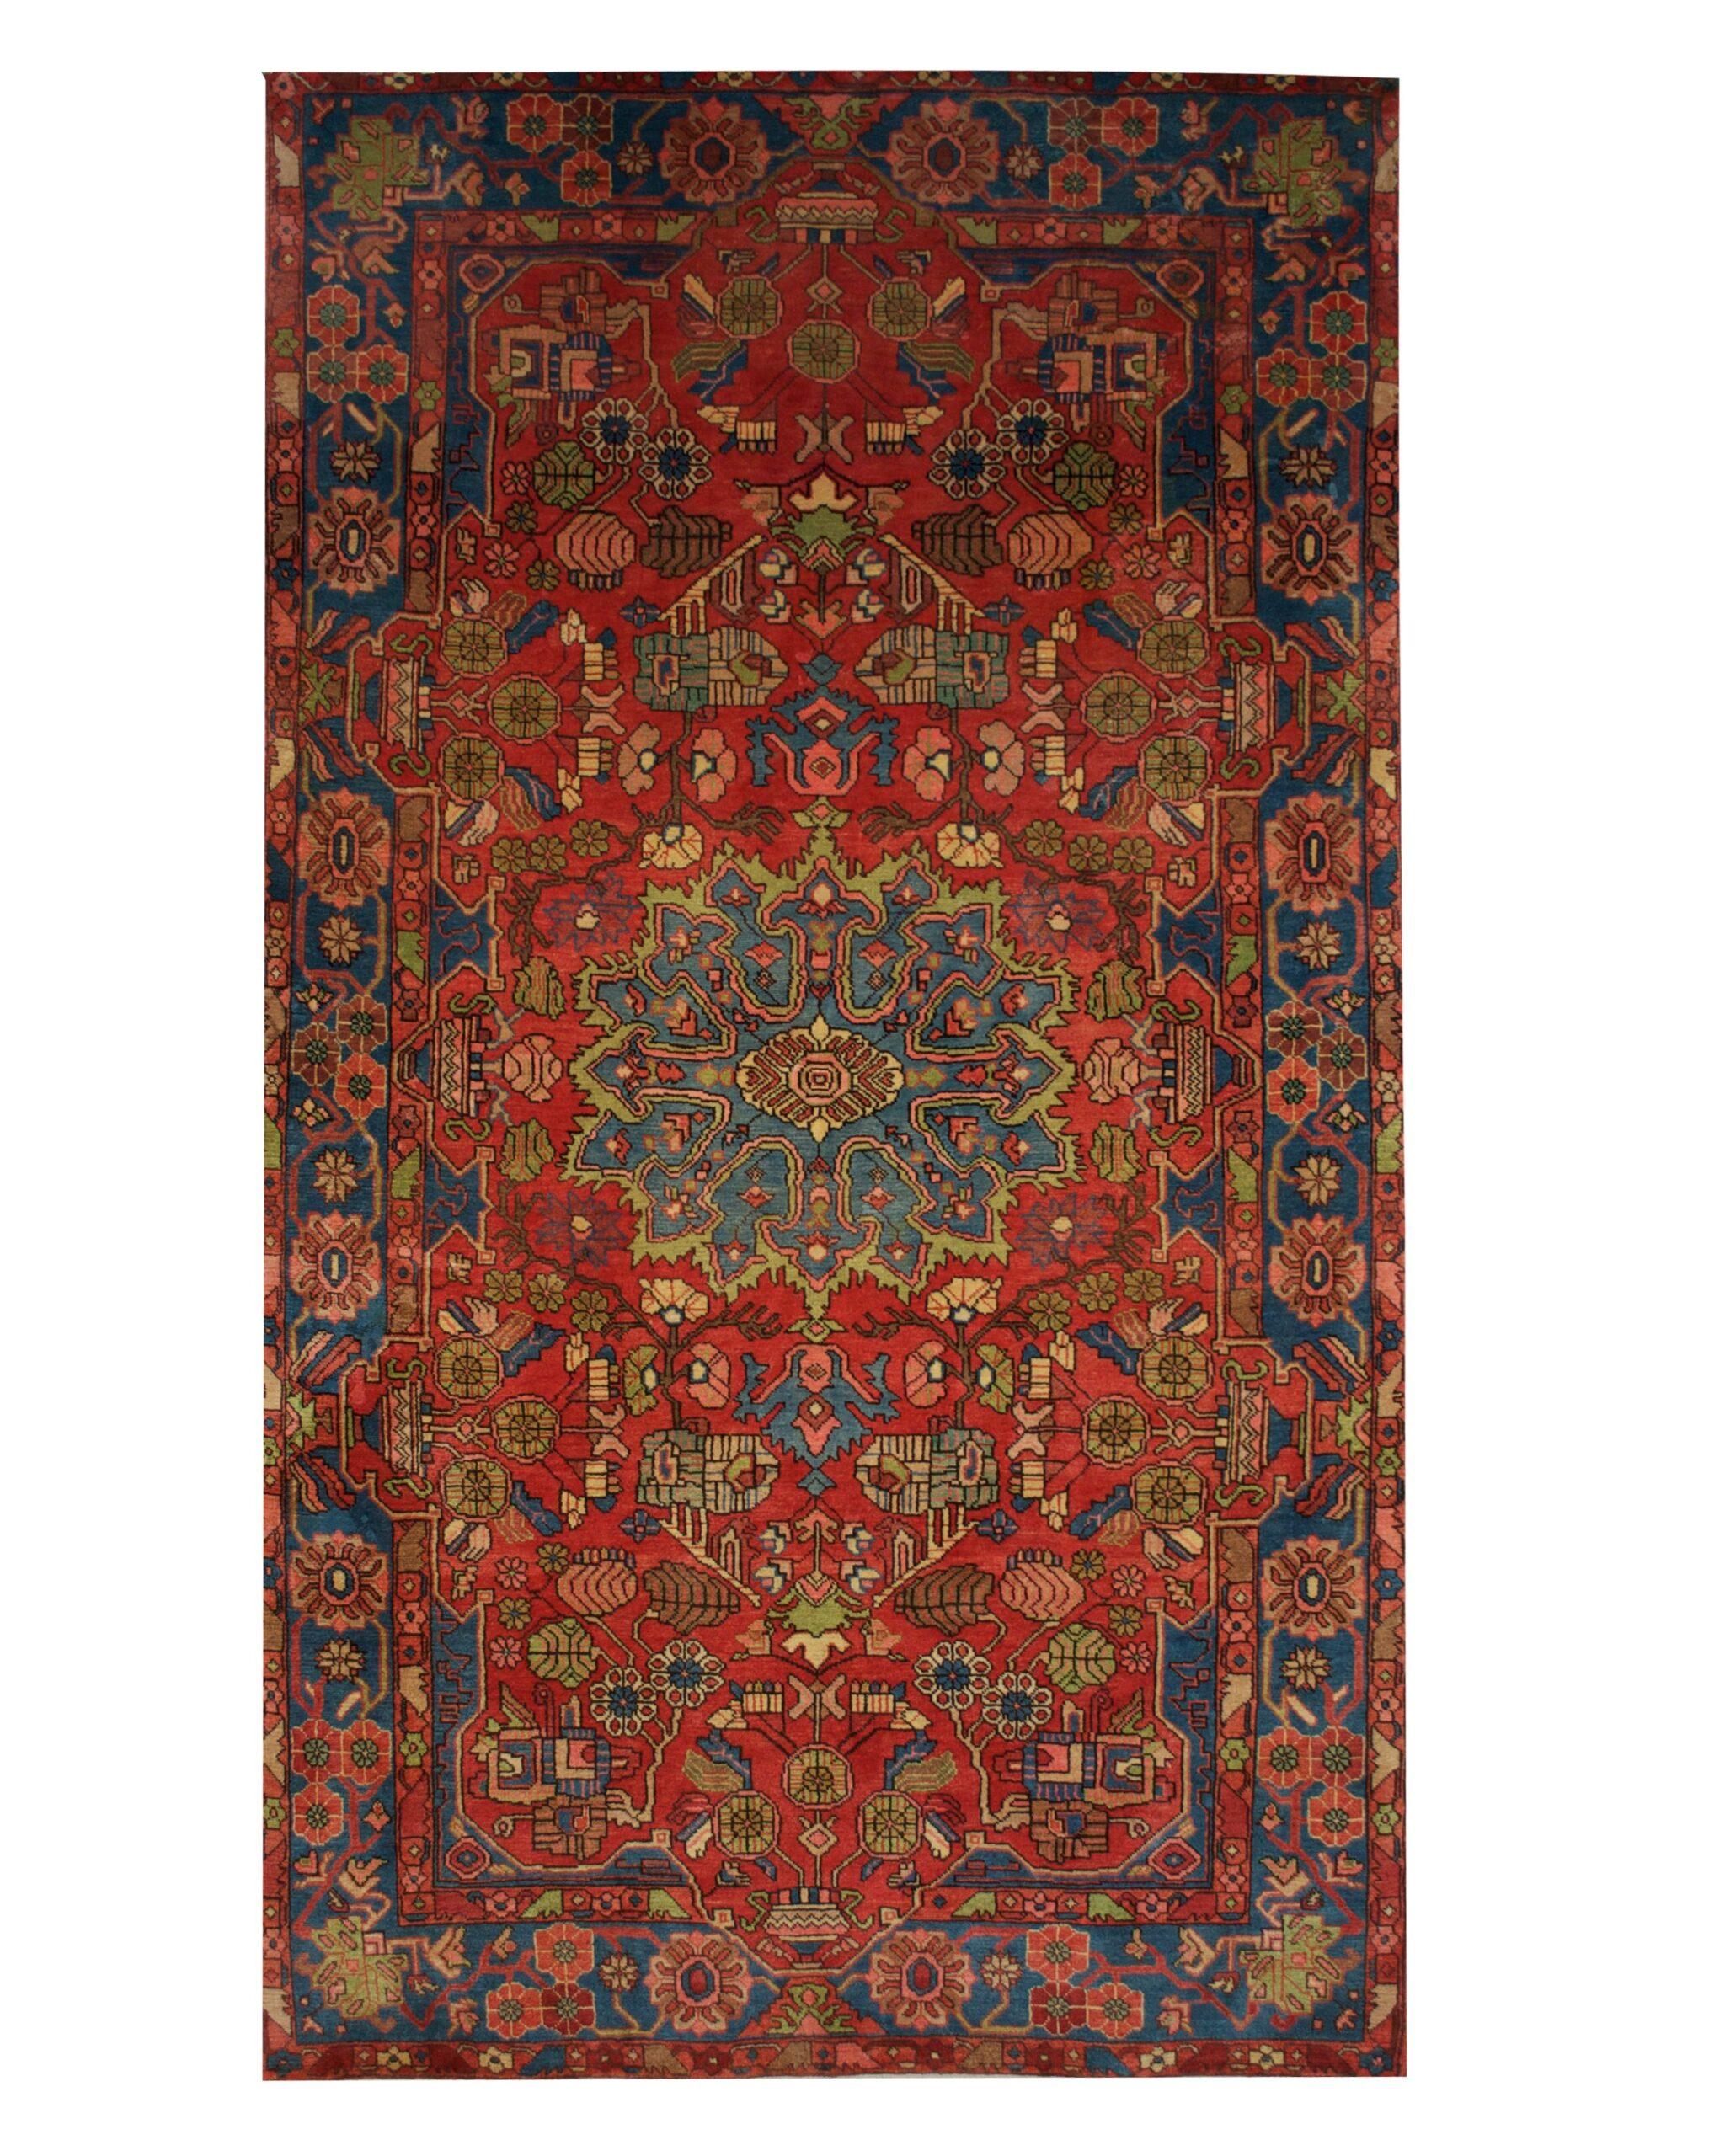 "Vintage Persian Nahavand 5' x 8' 6"" Handmade Wool Area Rug - Shabahang Royal Carpet"